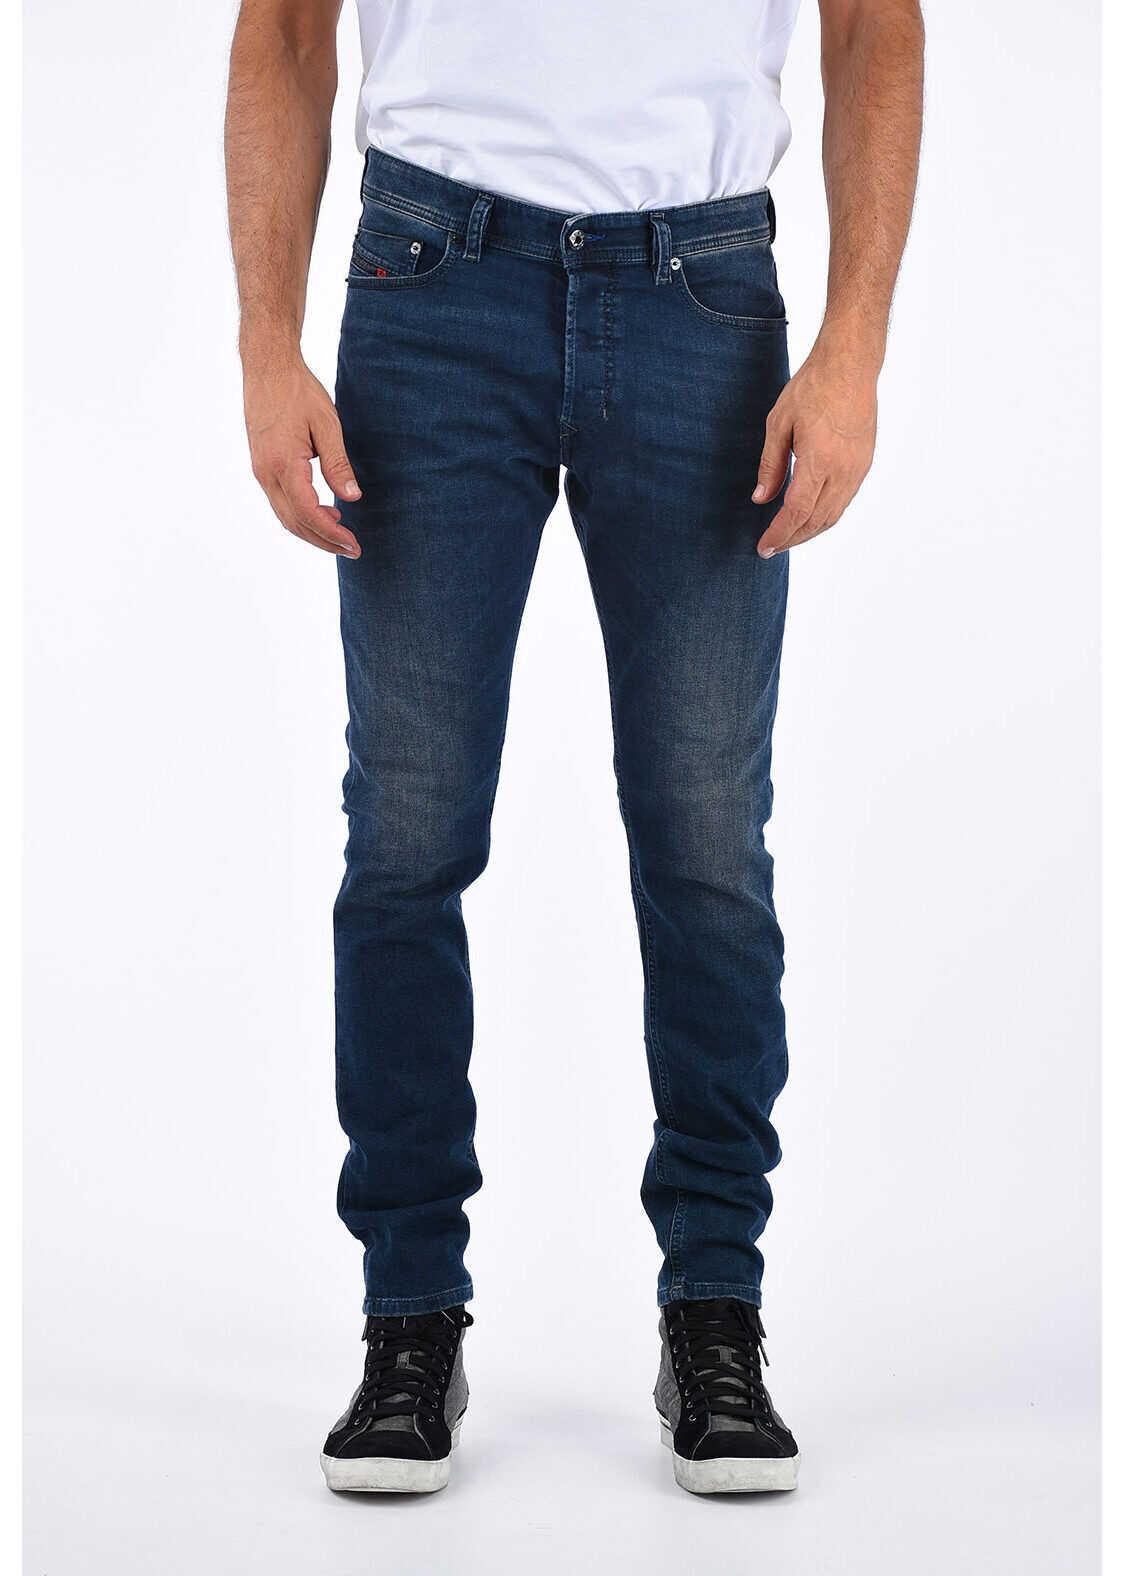 Diesel 16cm Stretch Denim TEPPHAR Jeans L.32 BLUE